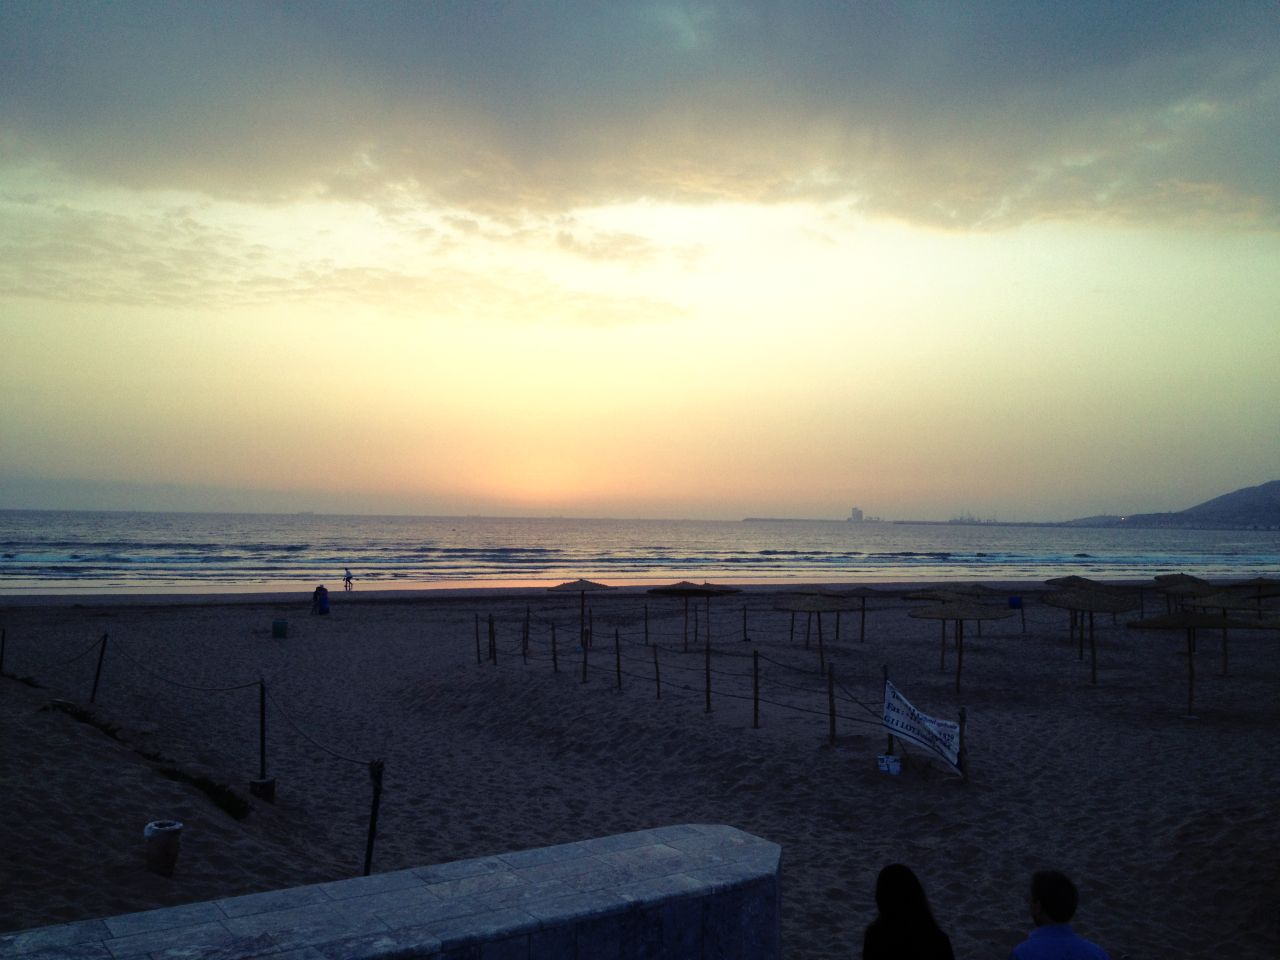 Sonnenuntergang in Agadir